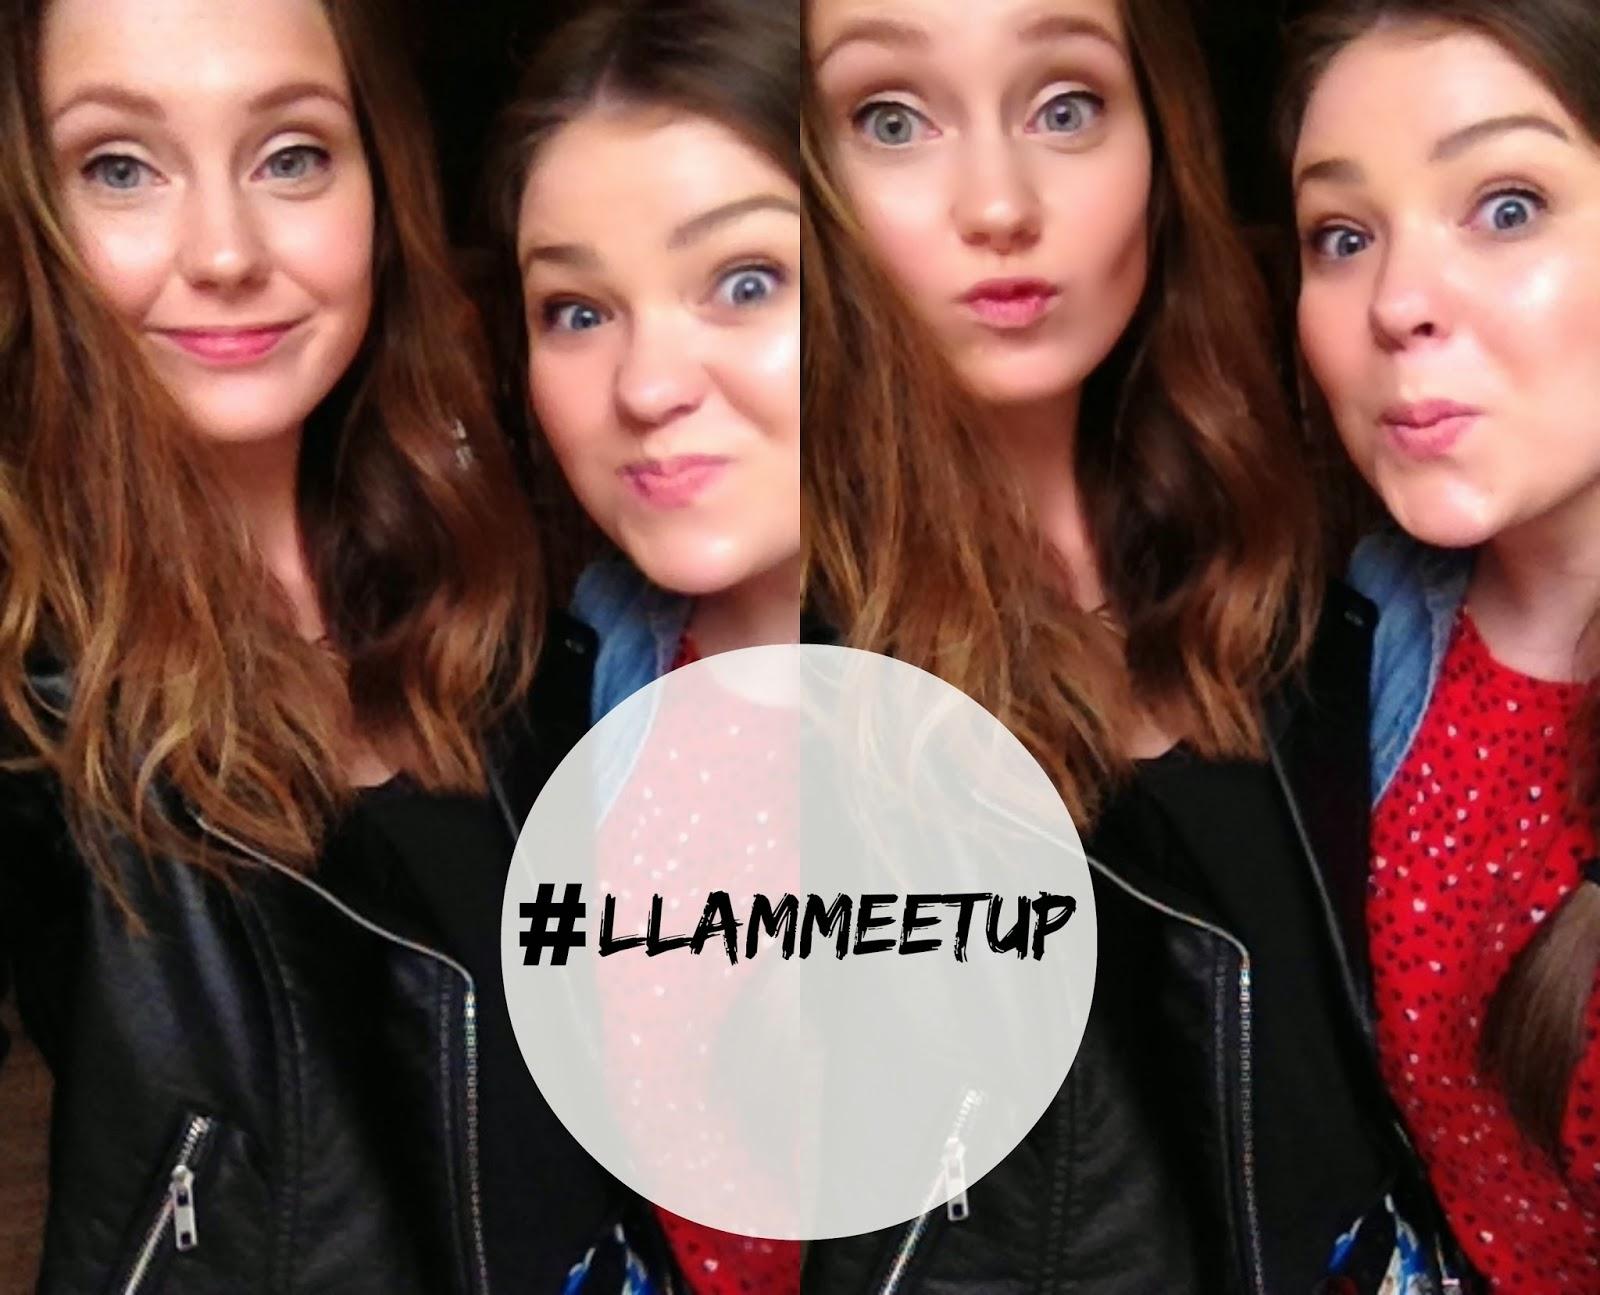 #LLAMmeetup